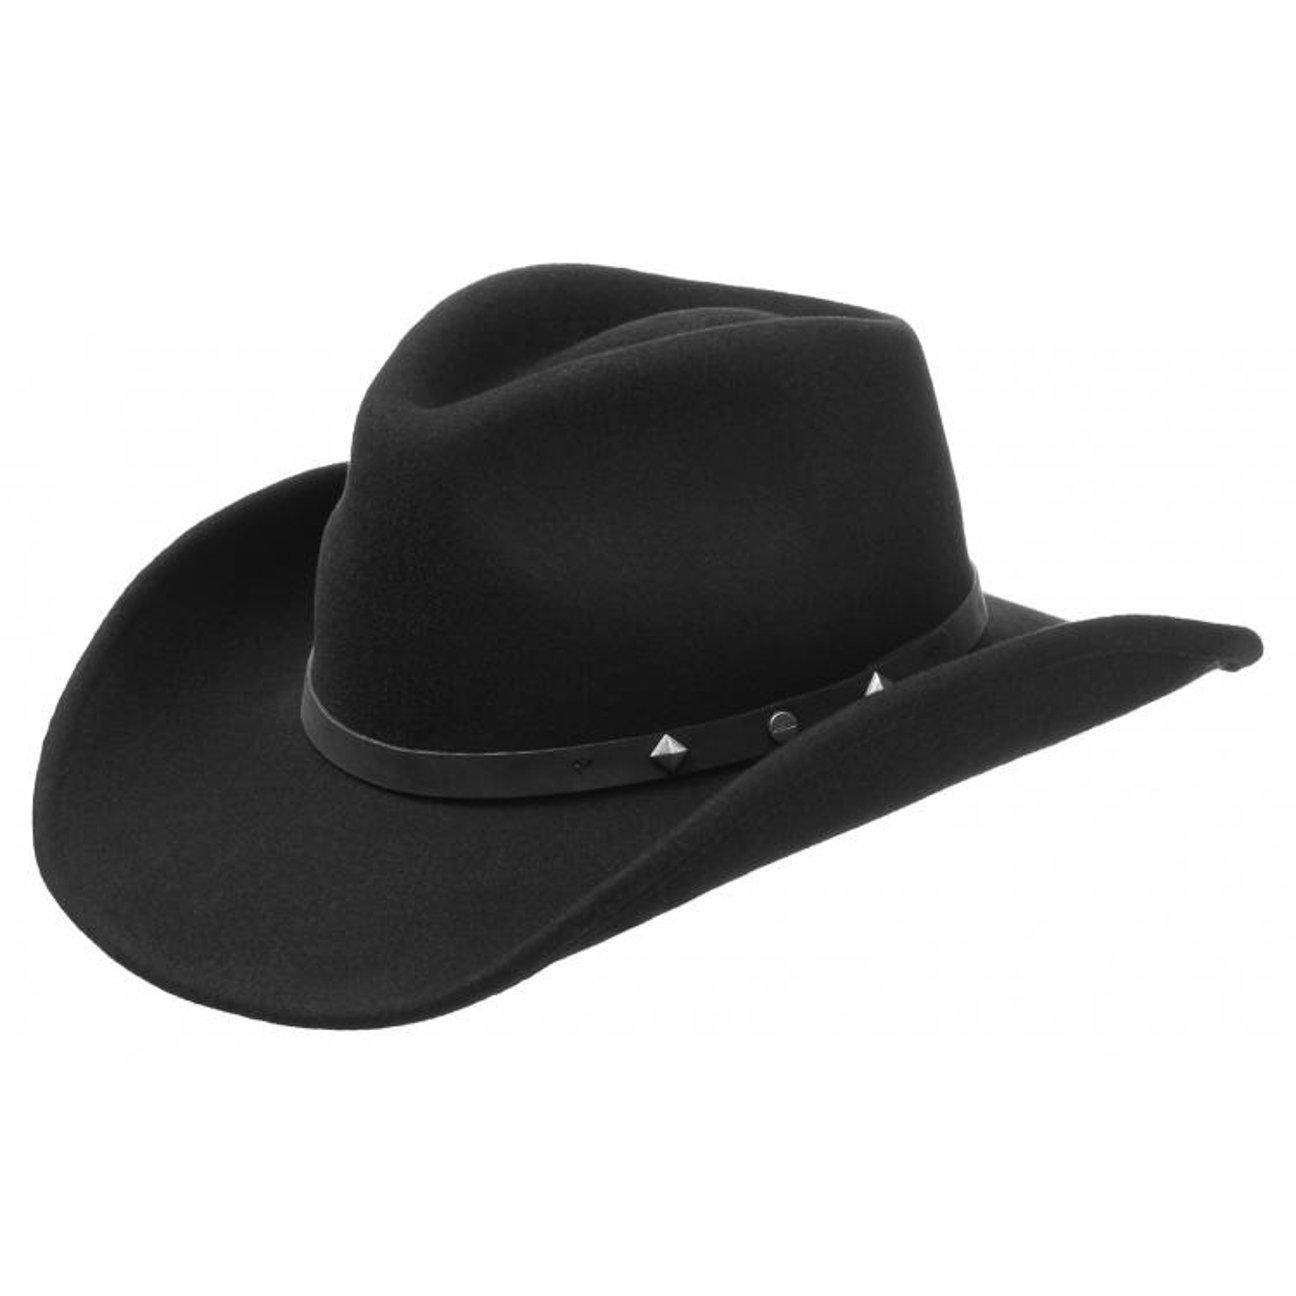 5ecdb7f3f4c Stetson Bangs Western Hat felt wool  Amazon.co.uk  Clothing